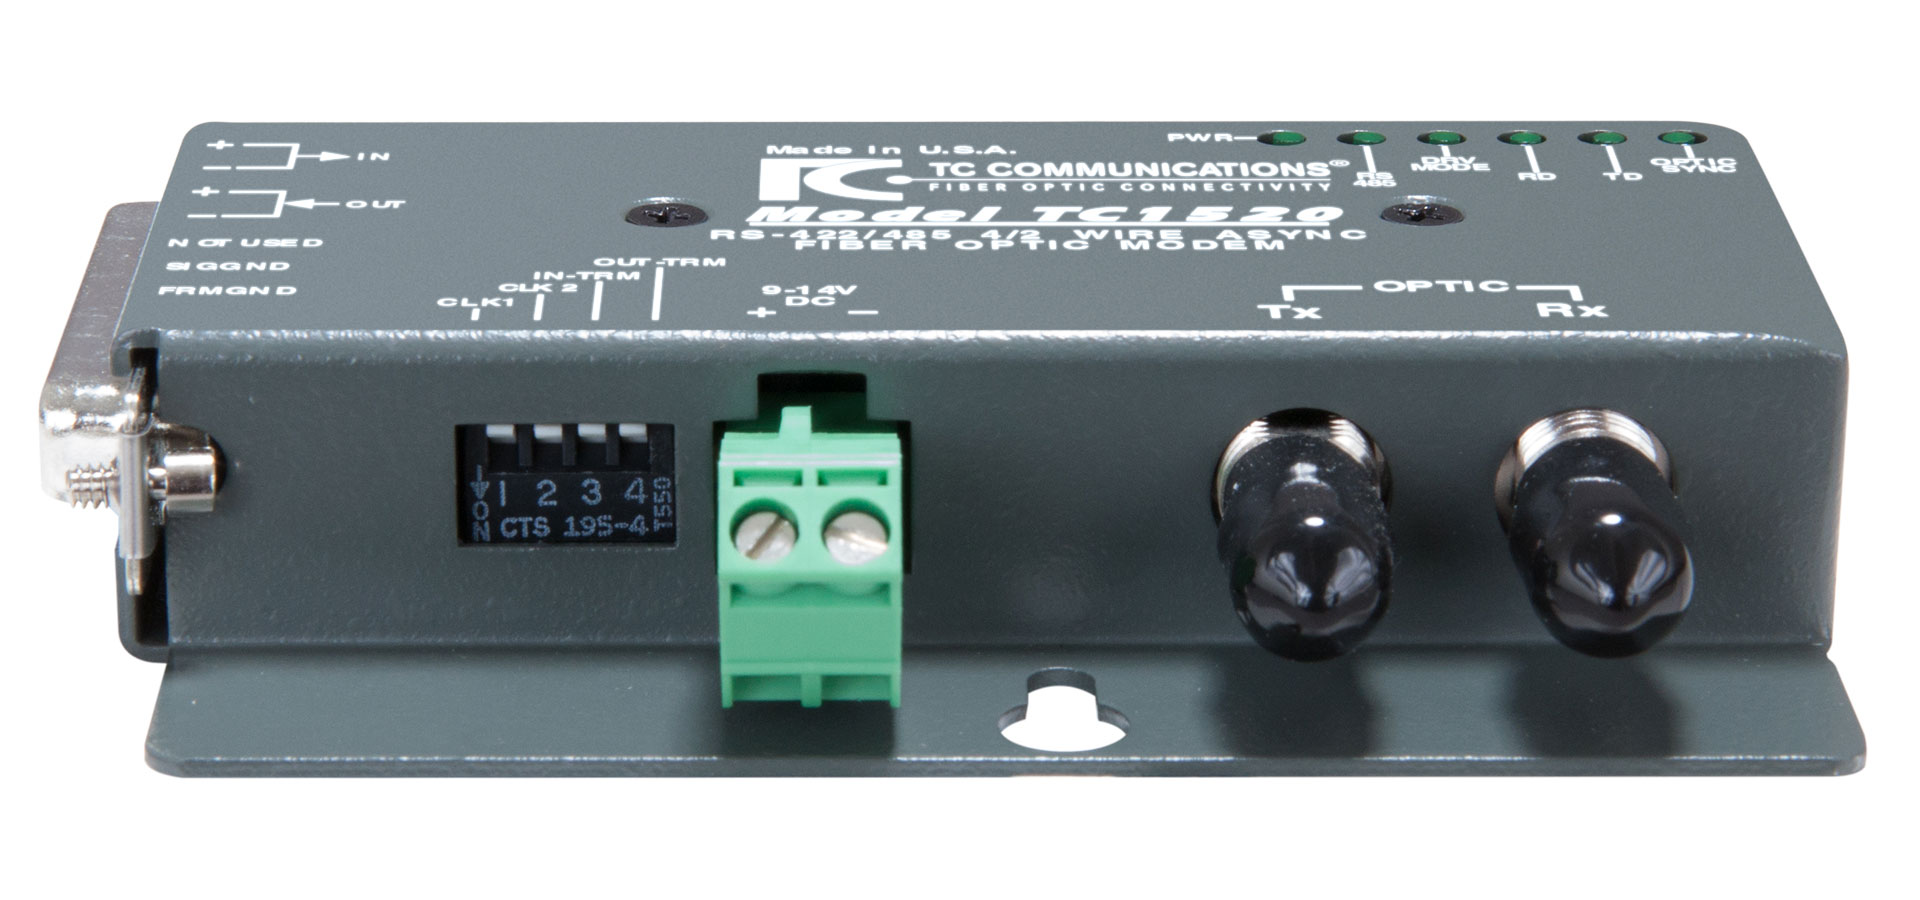 Tc1520 Rs 422 485 Fiber Optic Modem Tc Communications Rs485 2 Wire Diagram Front View Back